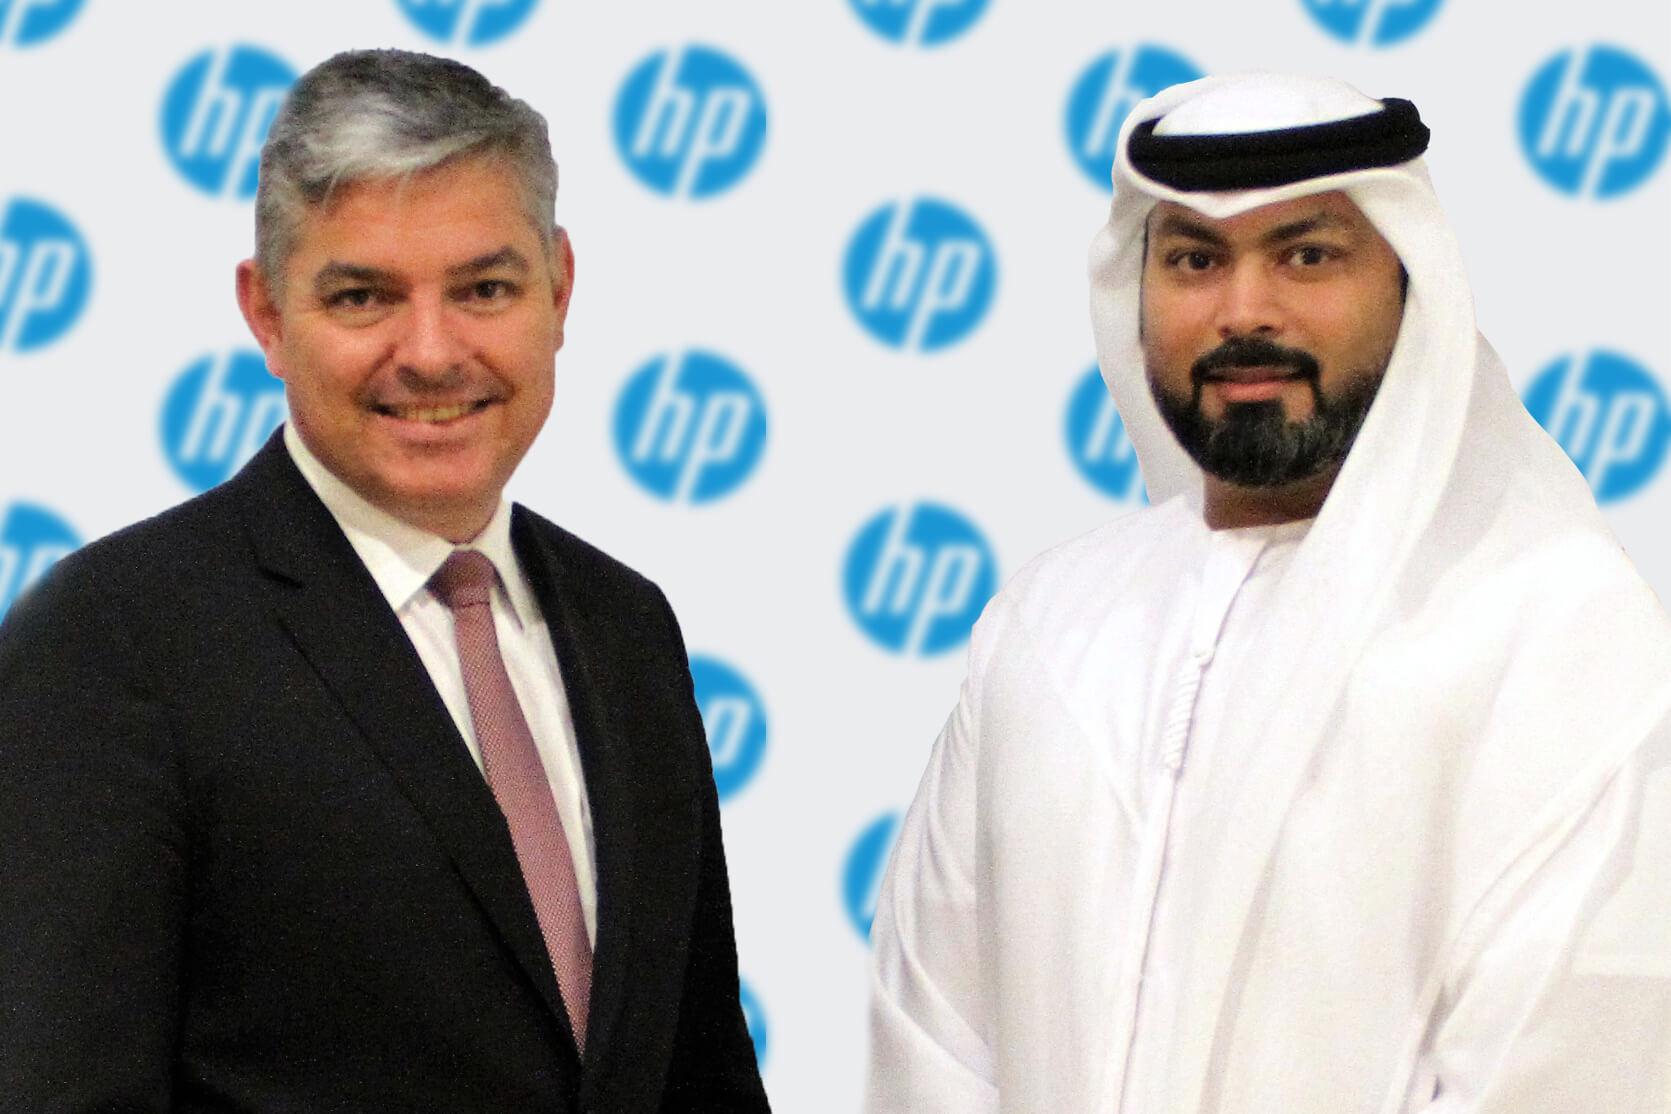 Dubai Cares, HP launch sustainability campaign | TahawulTech com